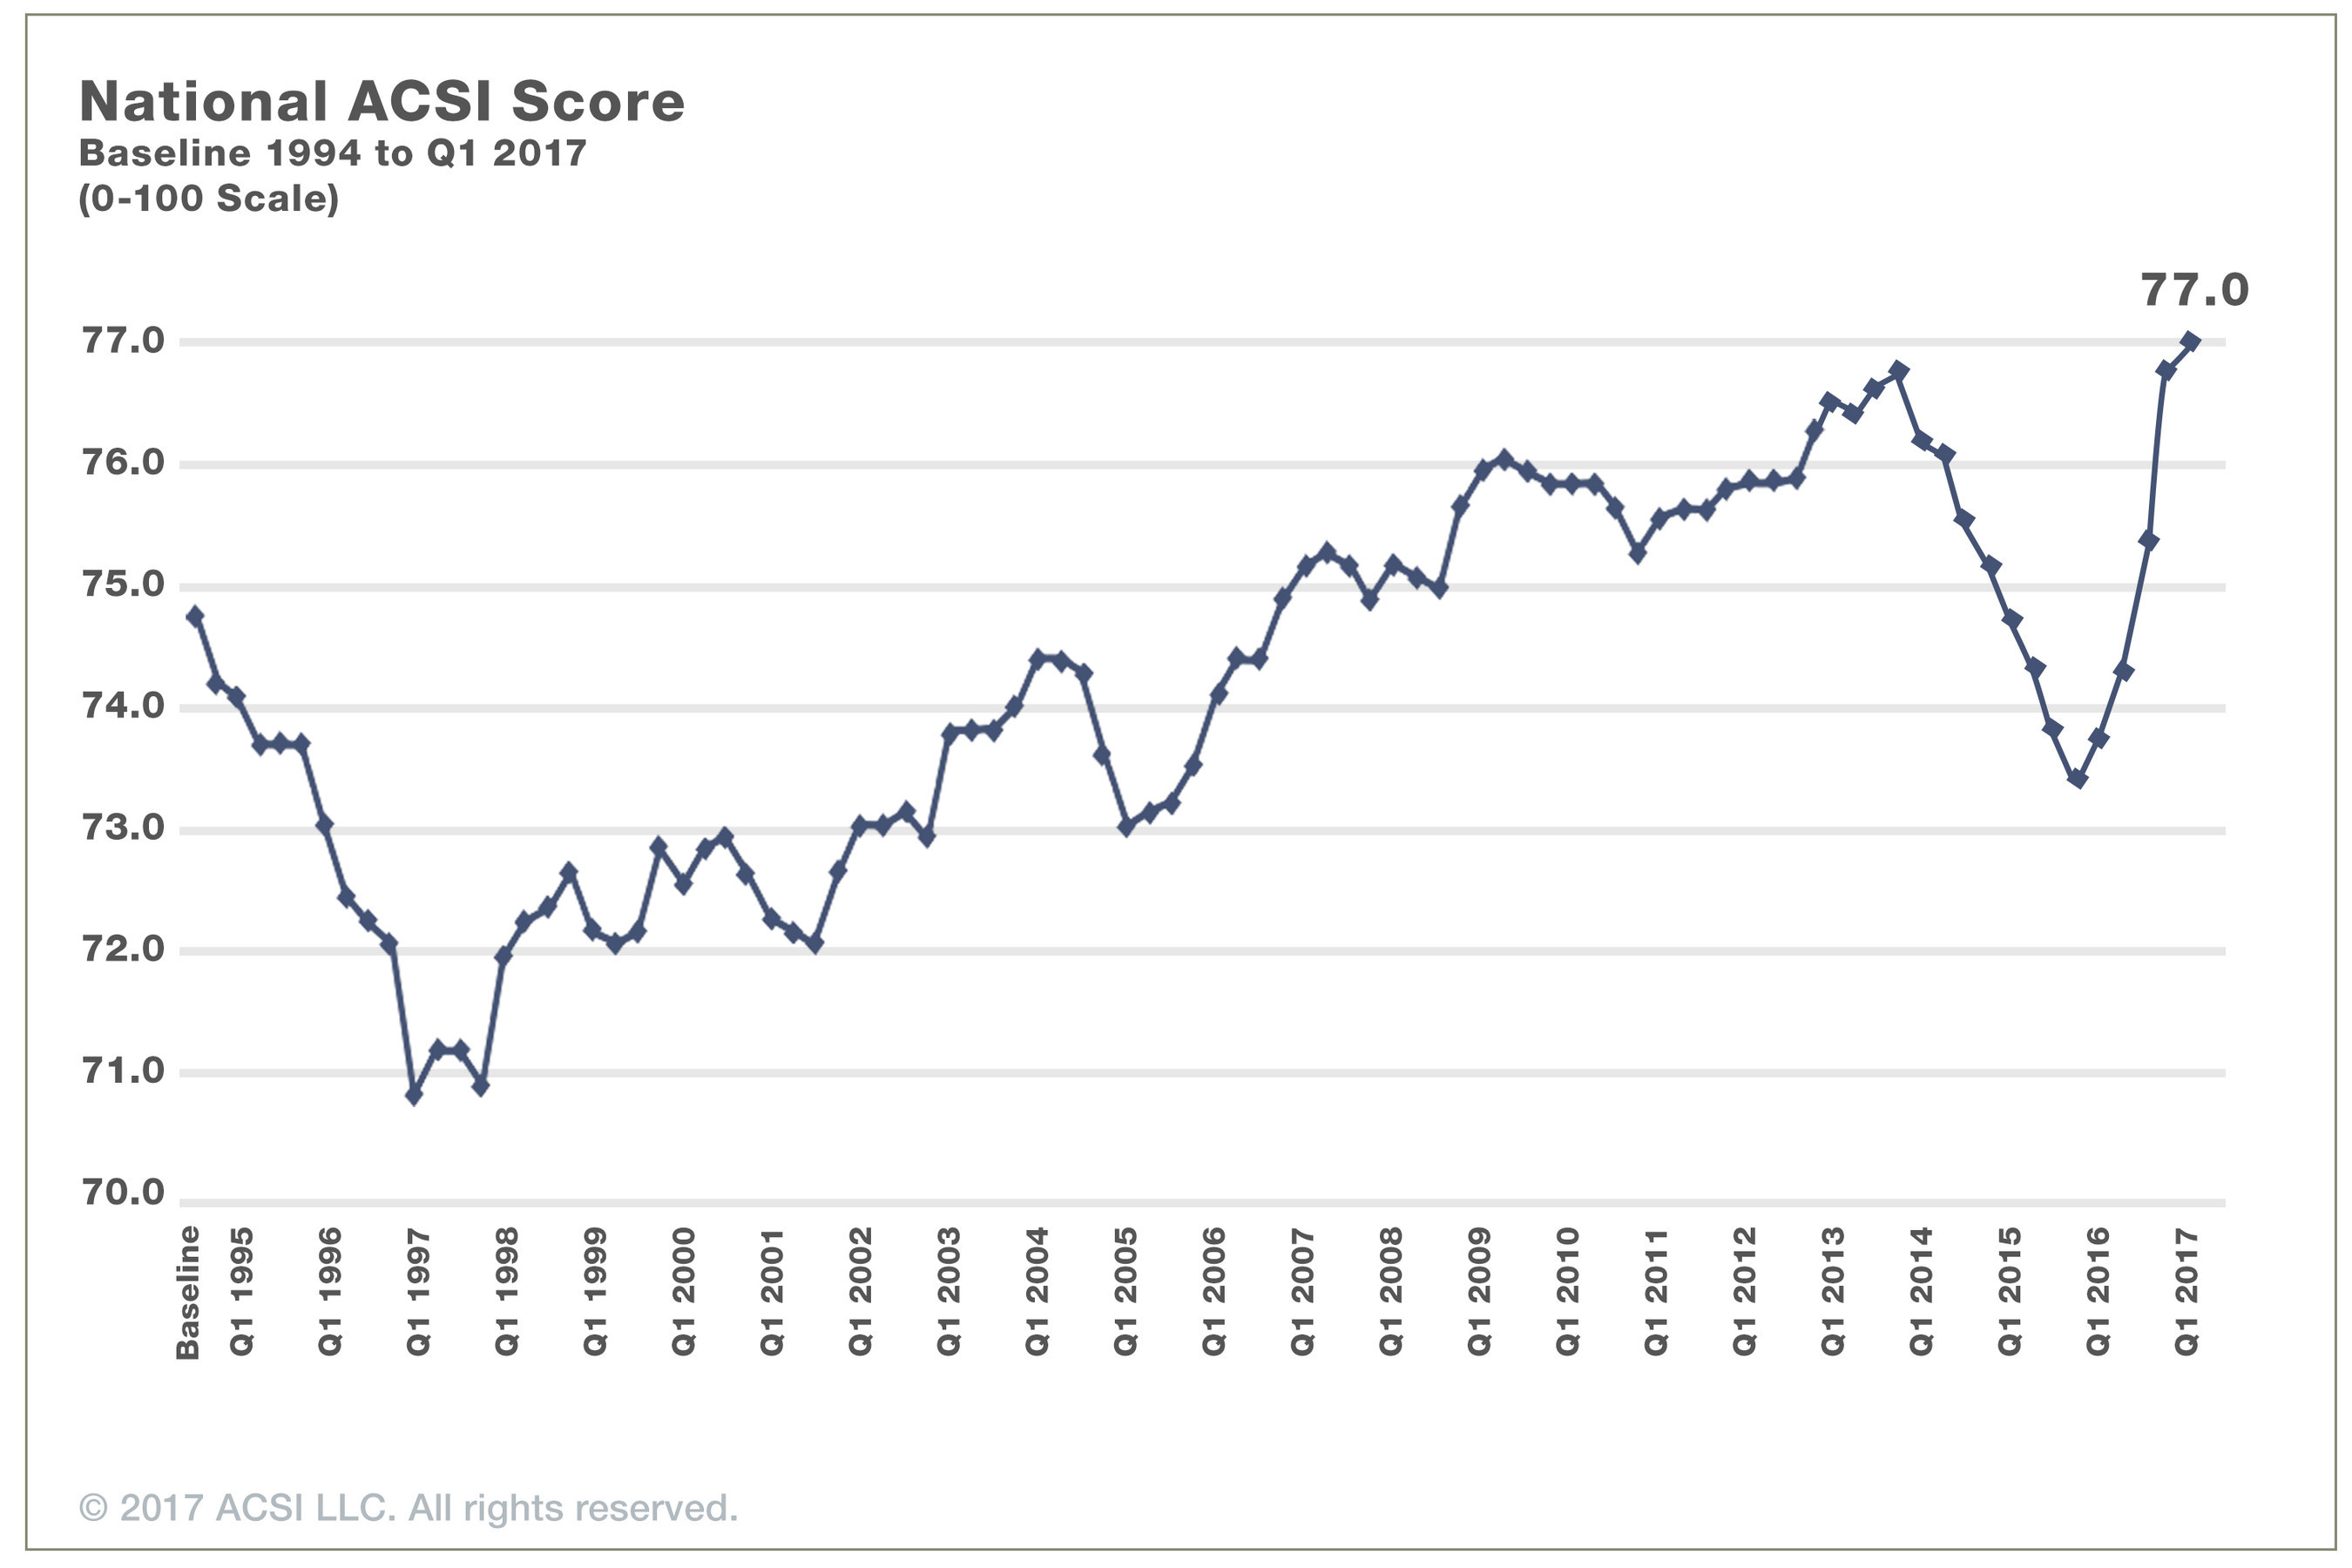 American Customer Satisfaction Index (ACSI) Q1 2017